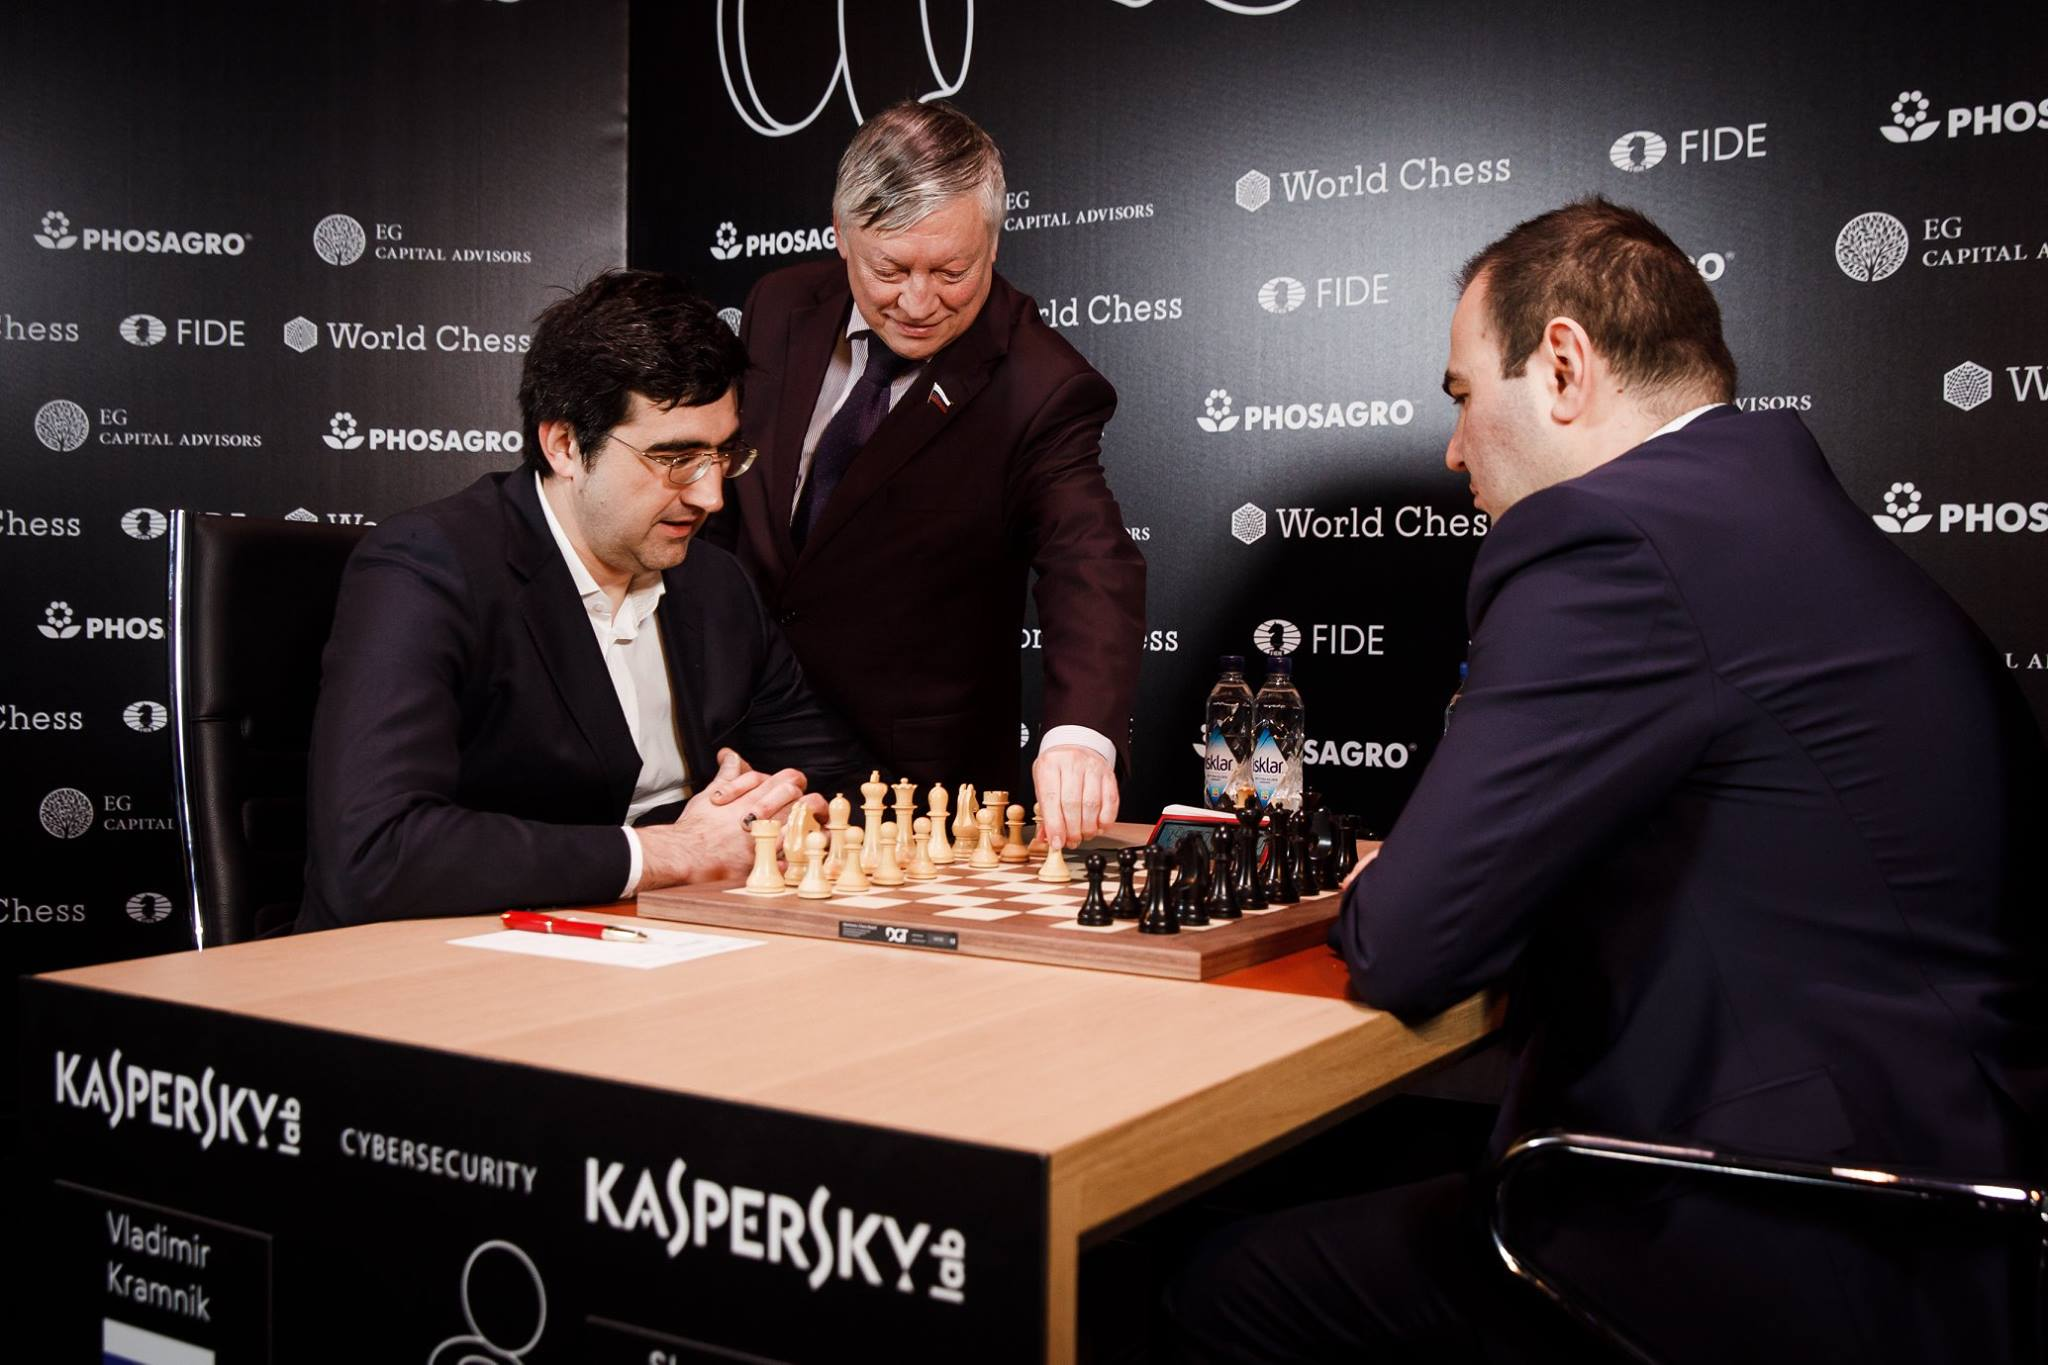 Chi è Anatolij Karpov